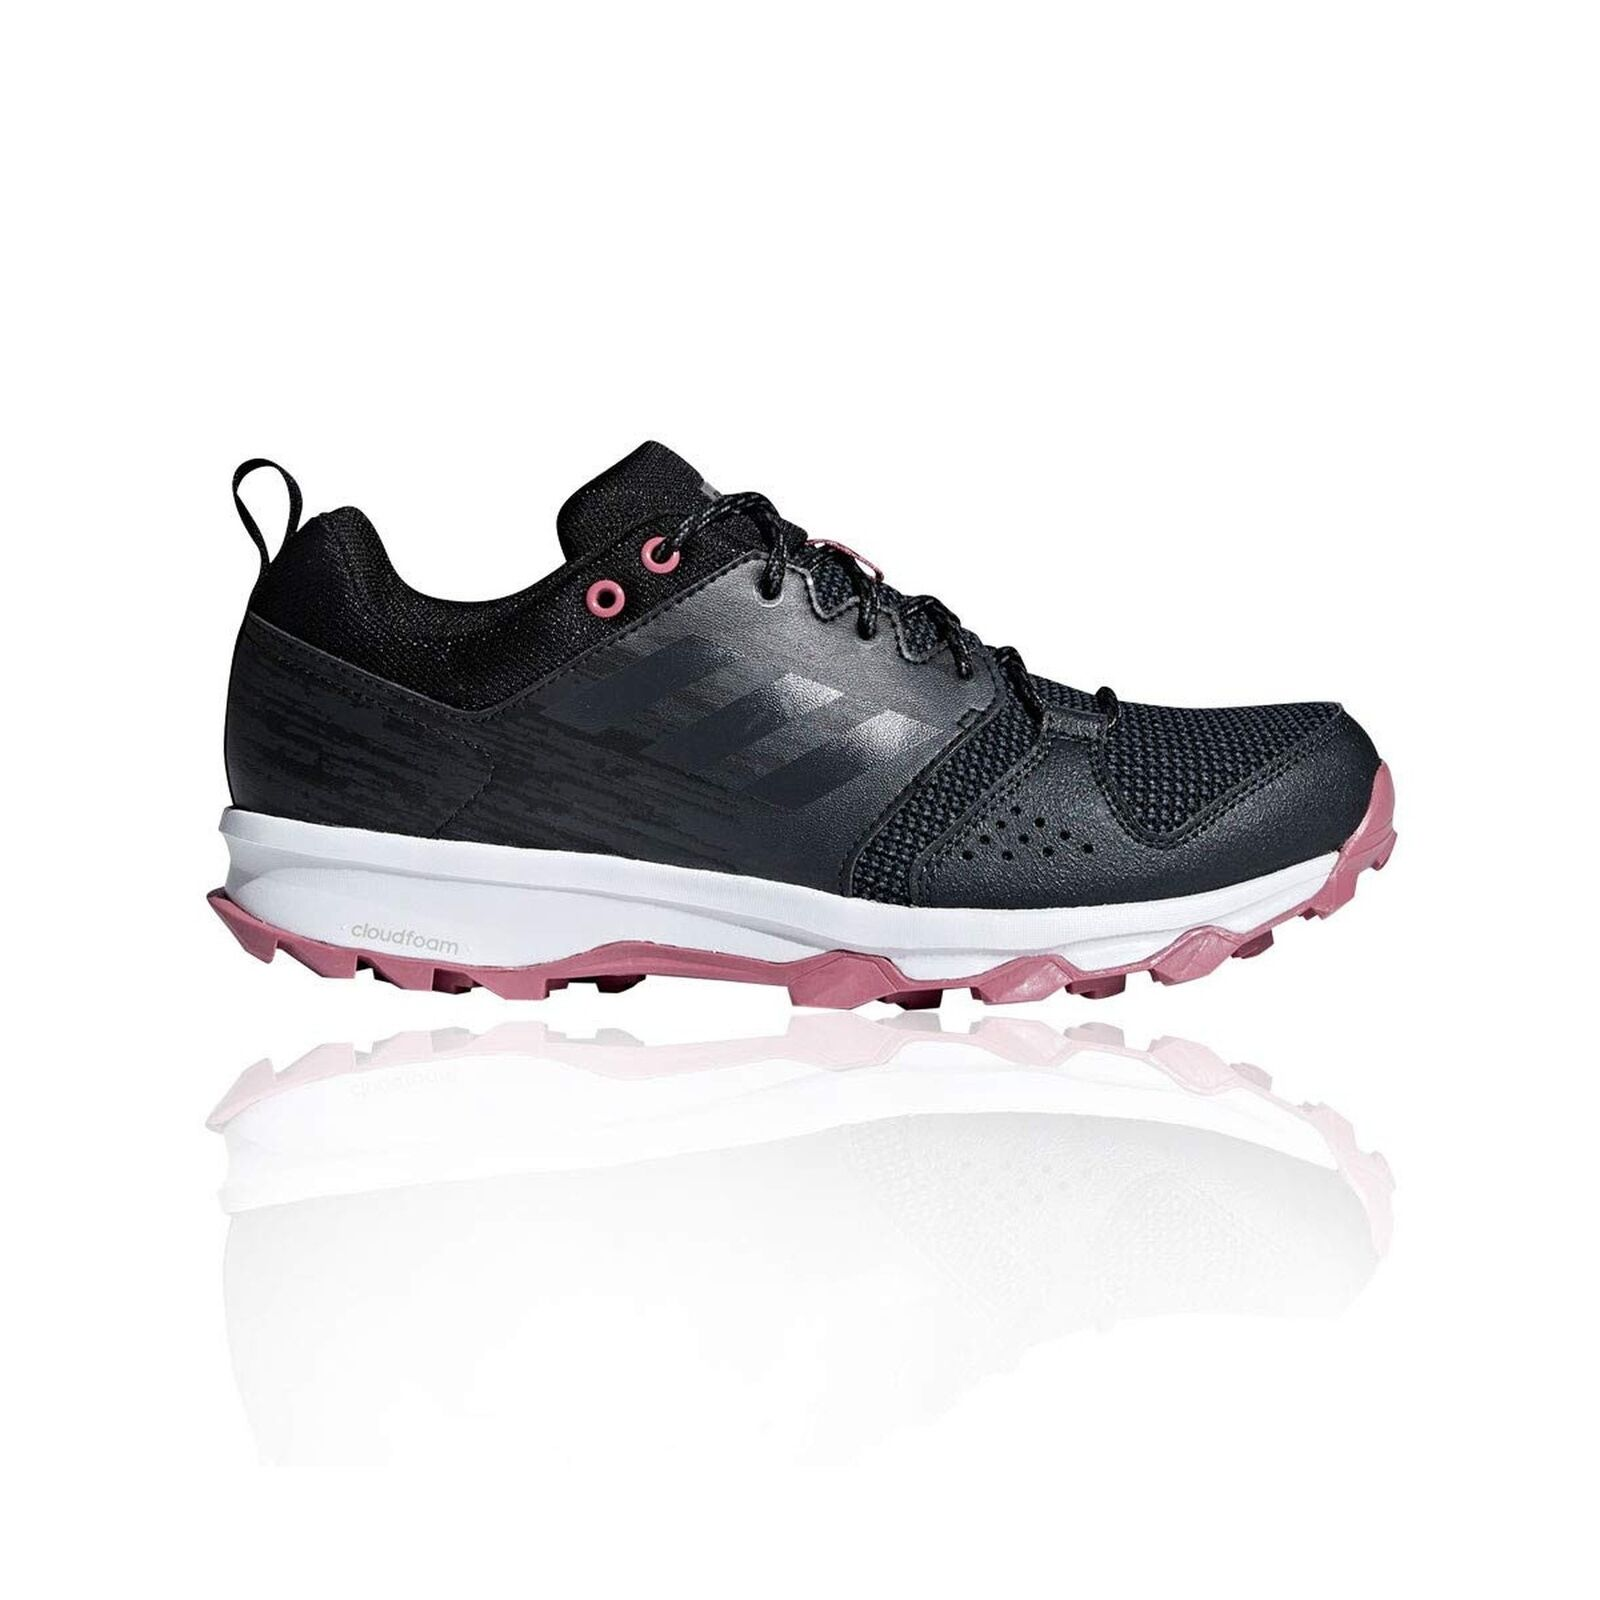 Descuento Adidas Para Para Para Mujer Zapatos Deportivos Galaxy Trail W 6 Reino Unido 5ac9ba